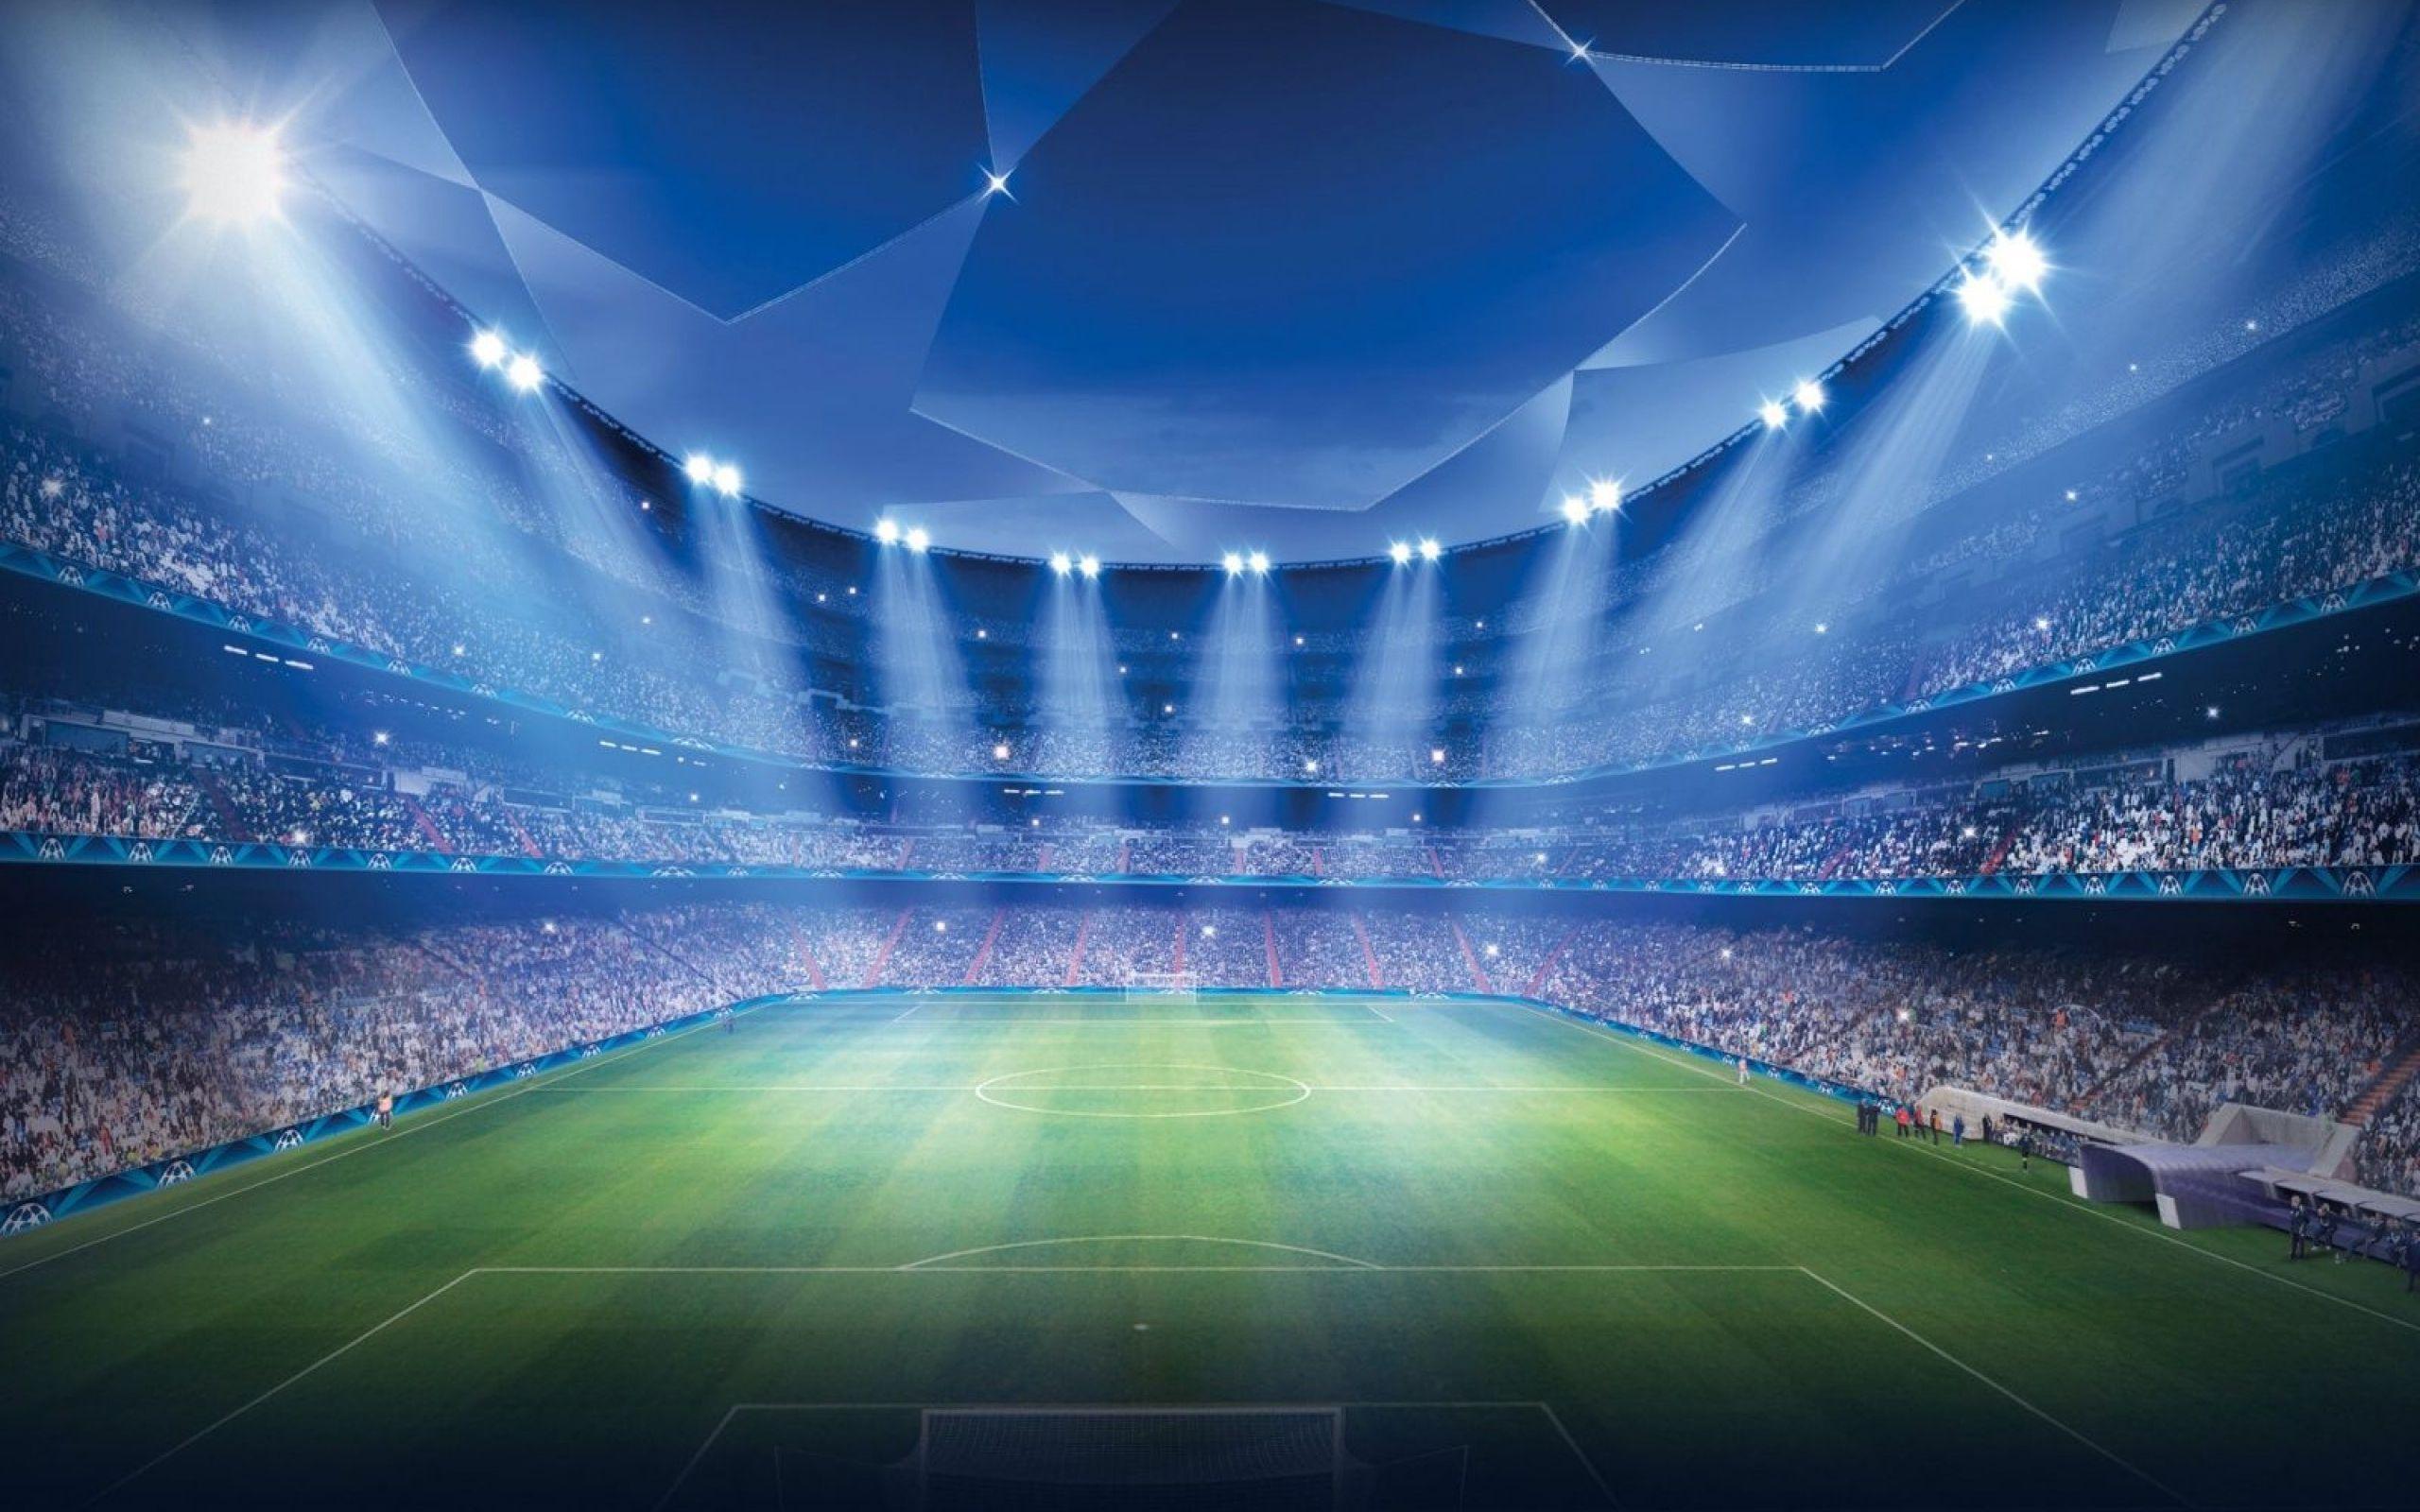 Cricket games to play 2020 ipl online ticket